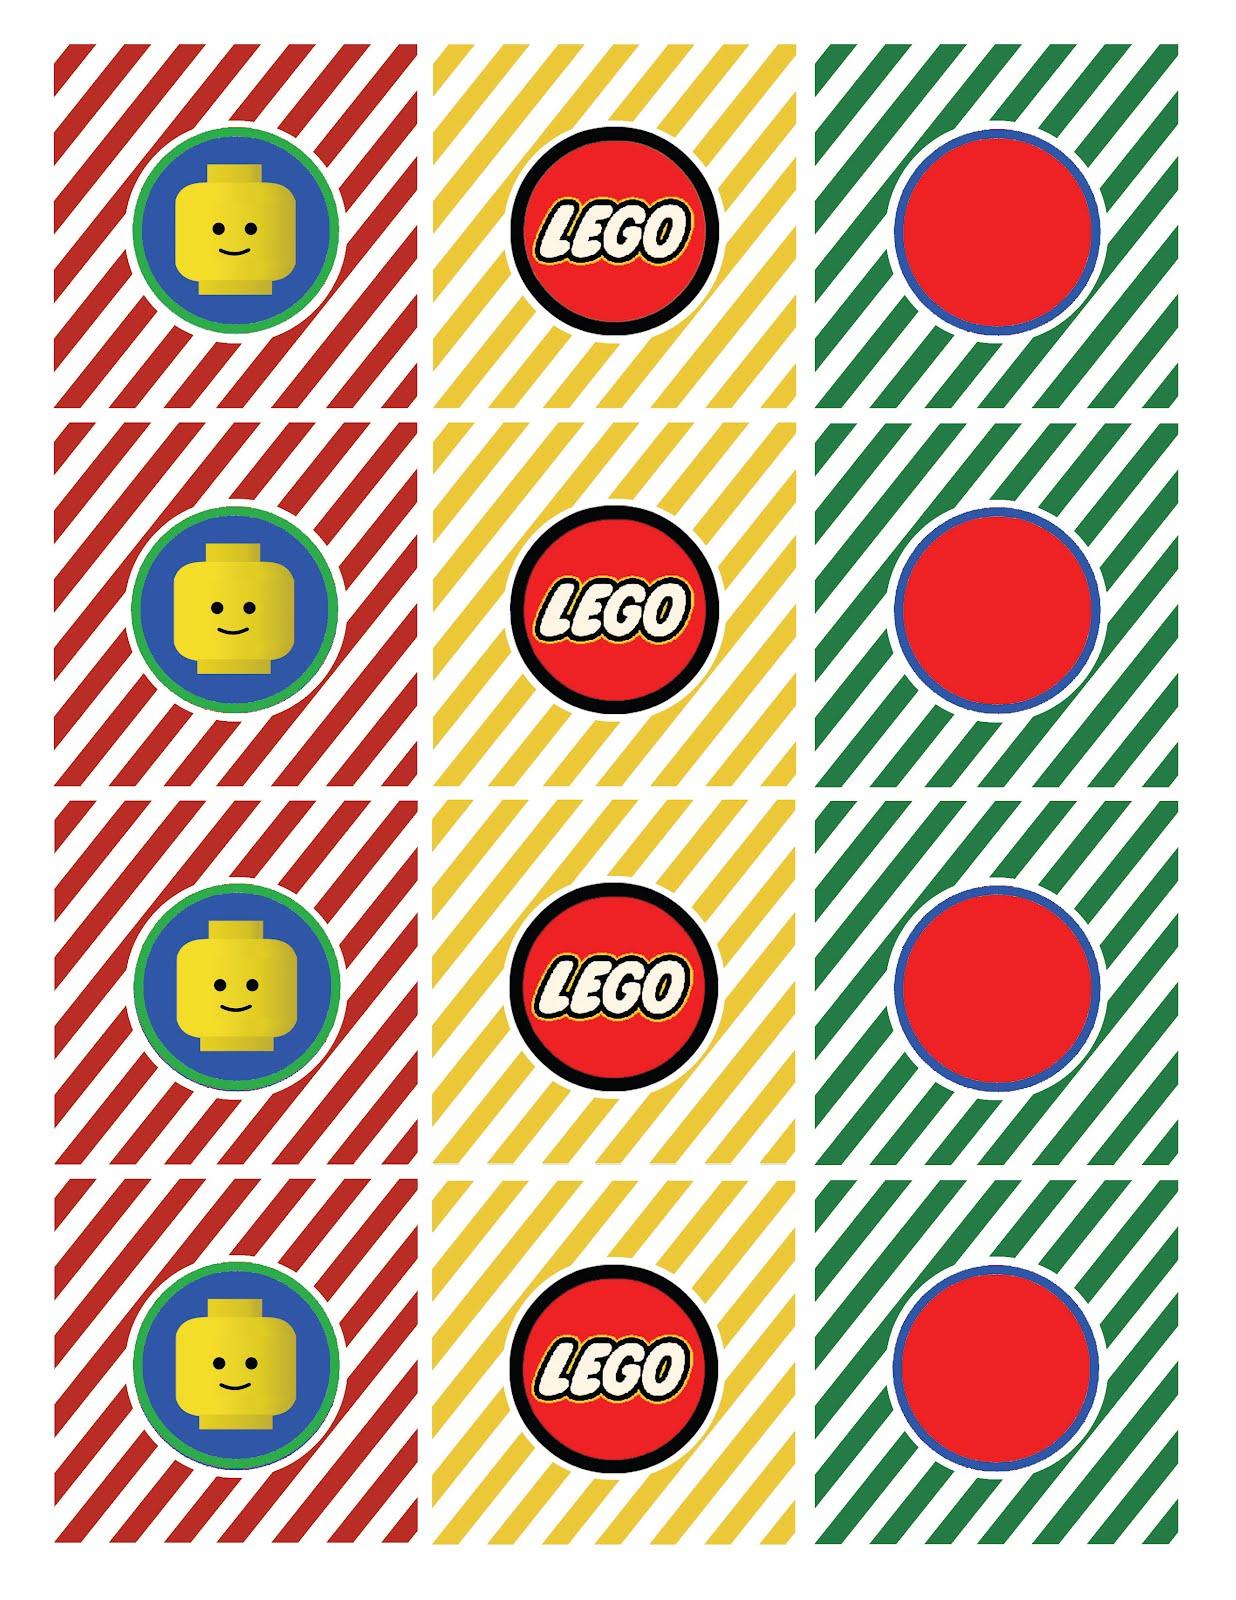 Printable Birthday Cards – Lego Birthday Card Printable